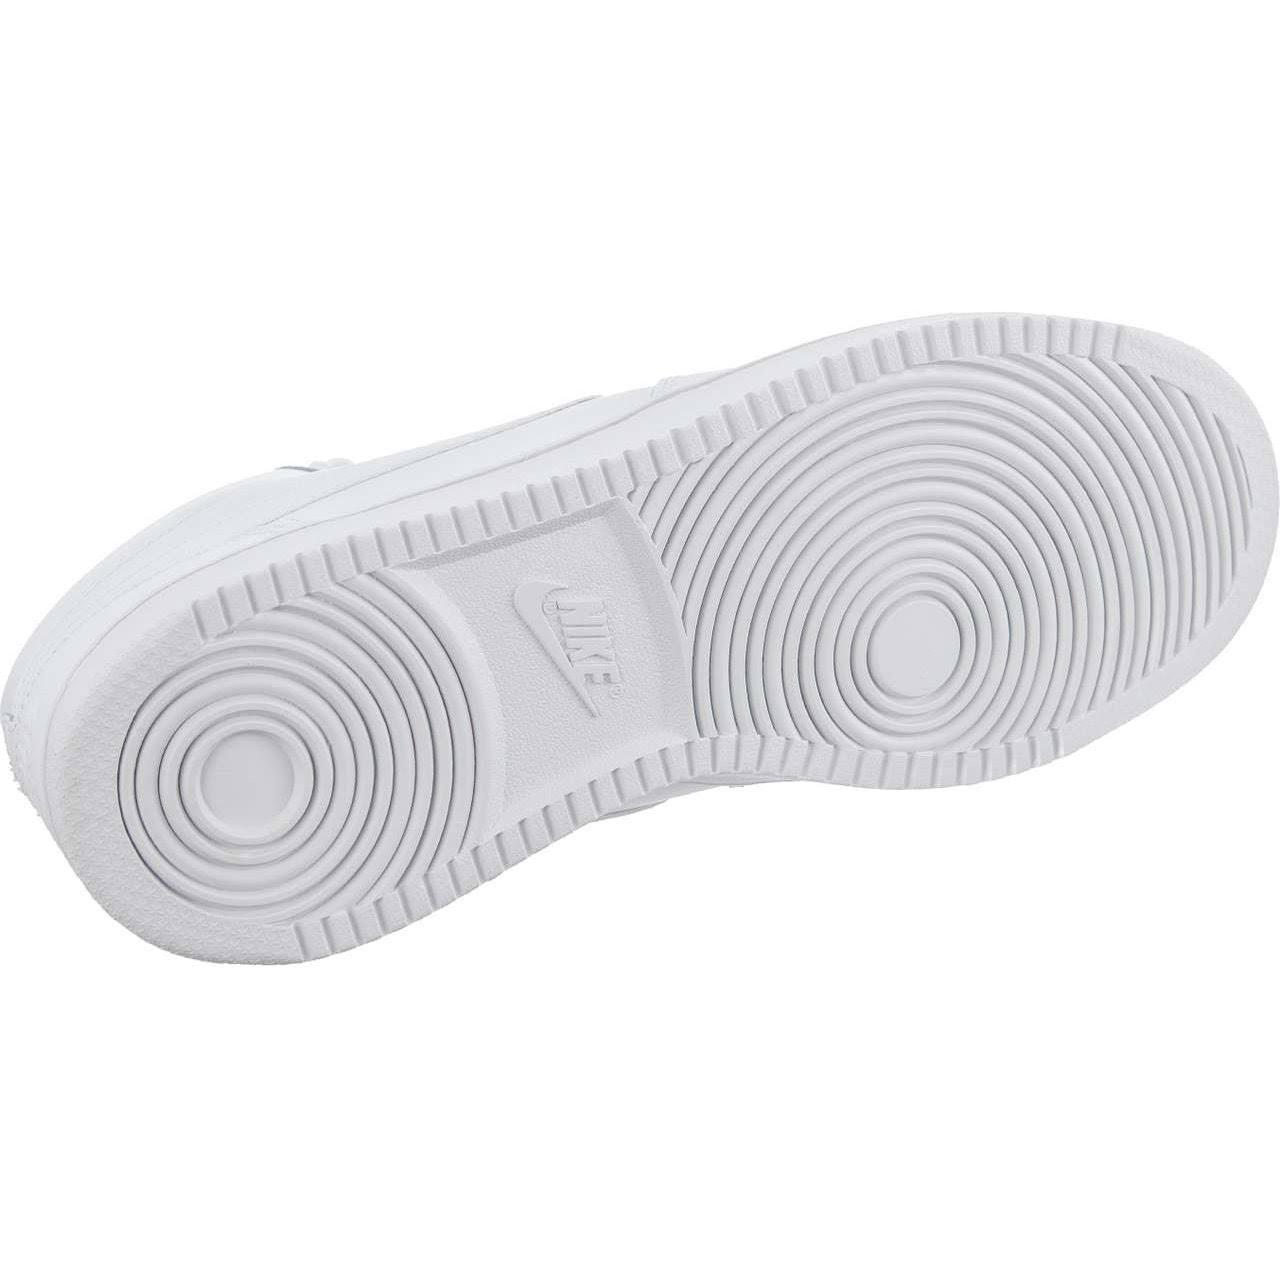 Scarpa Nike Ebernon Mid - Donna - Bianco